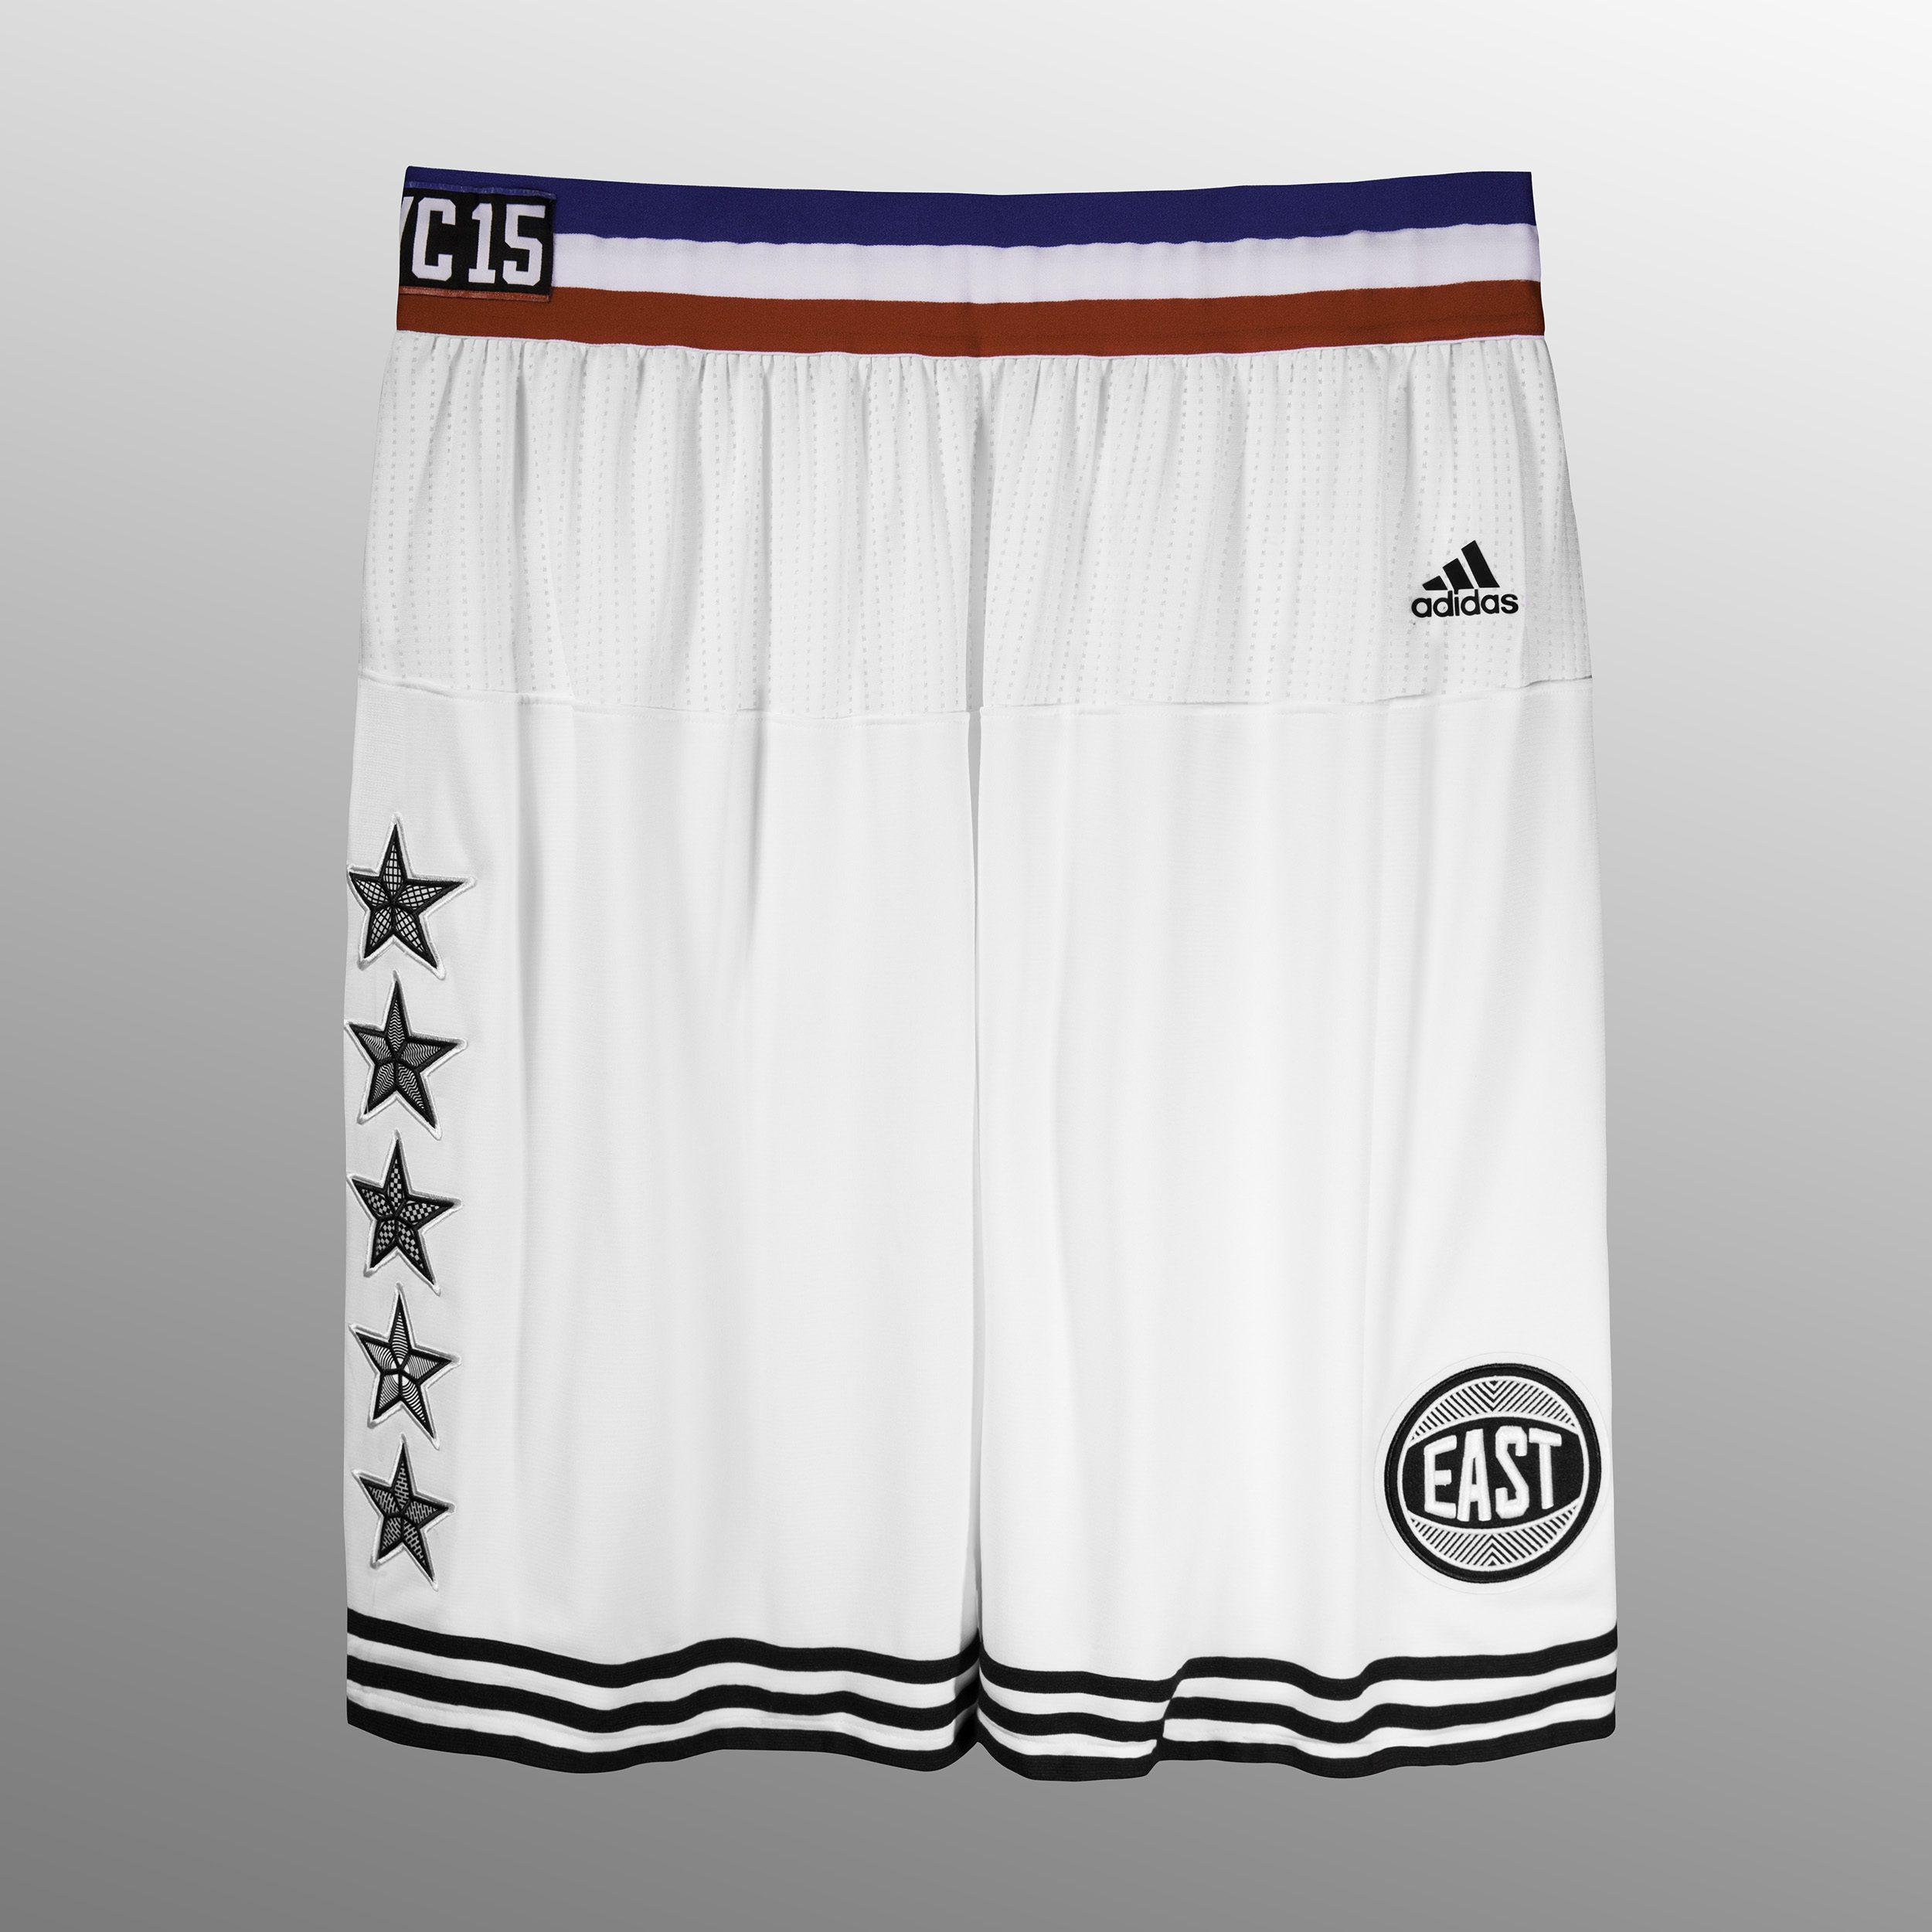 adidas NBA All-Star East Short, Sq